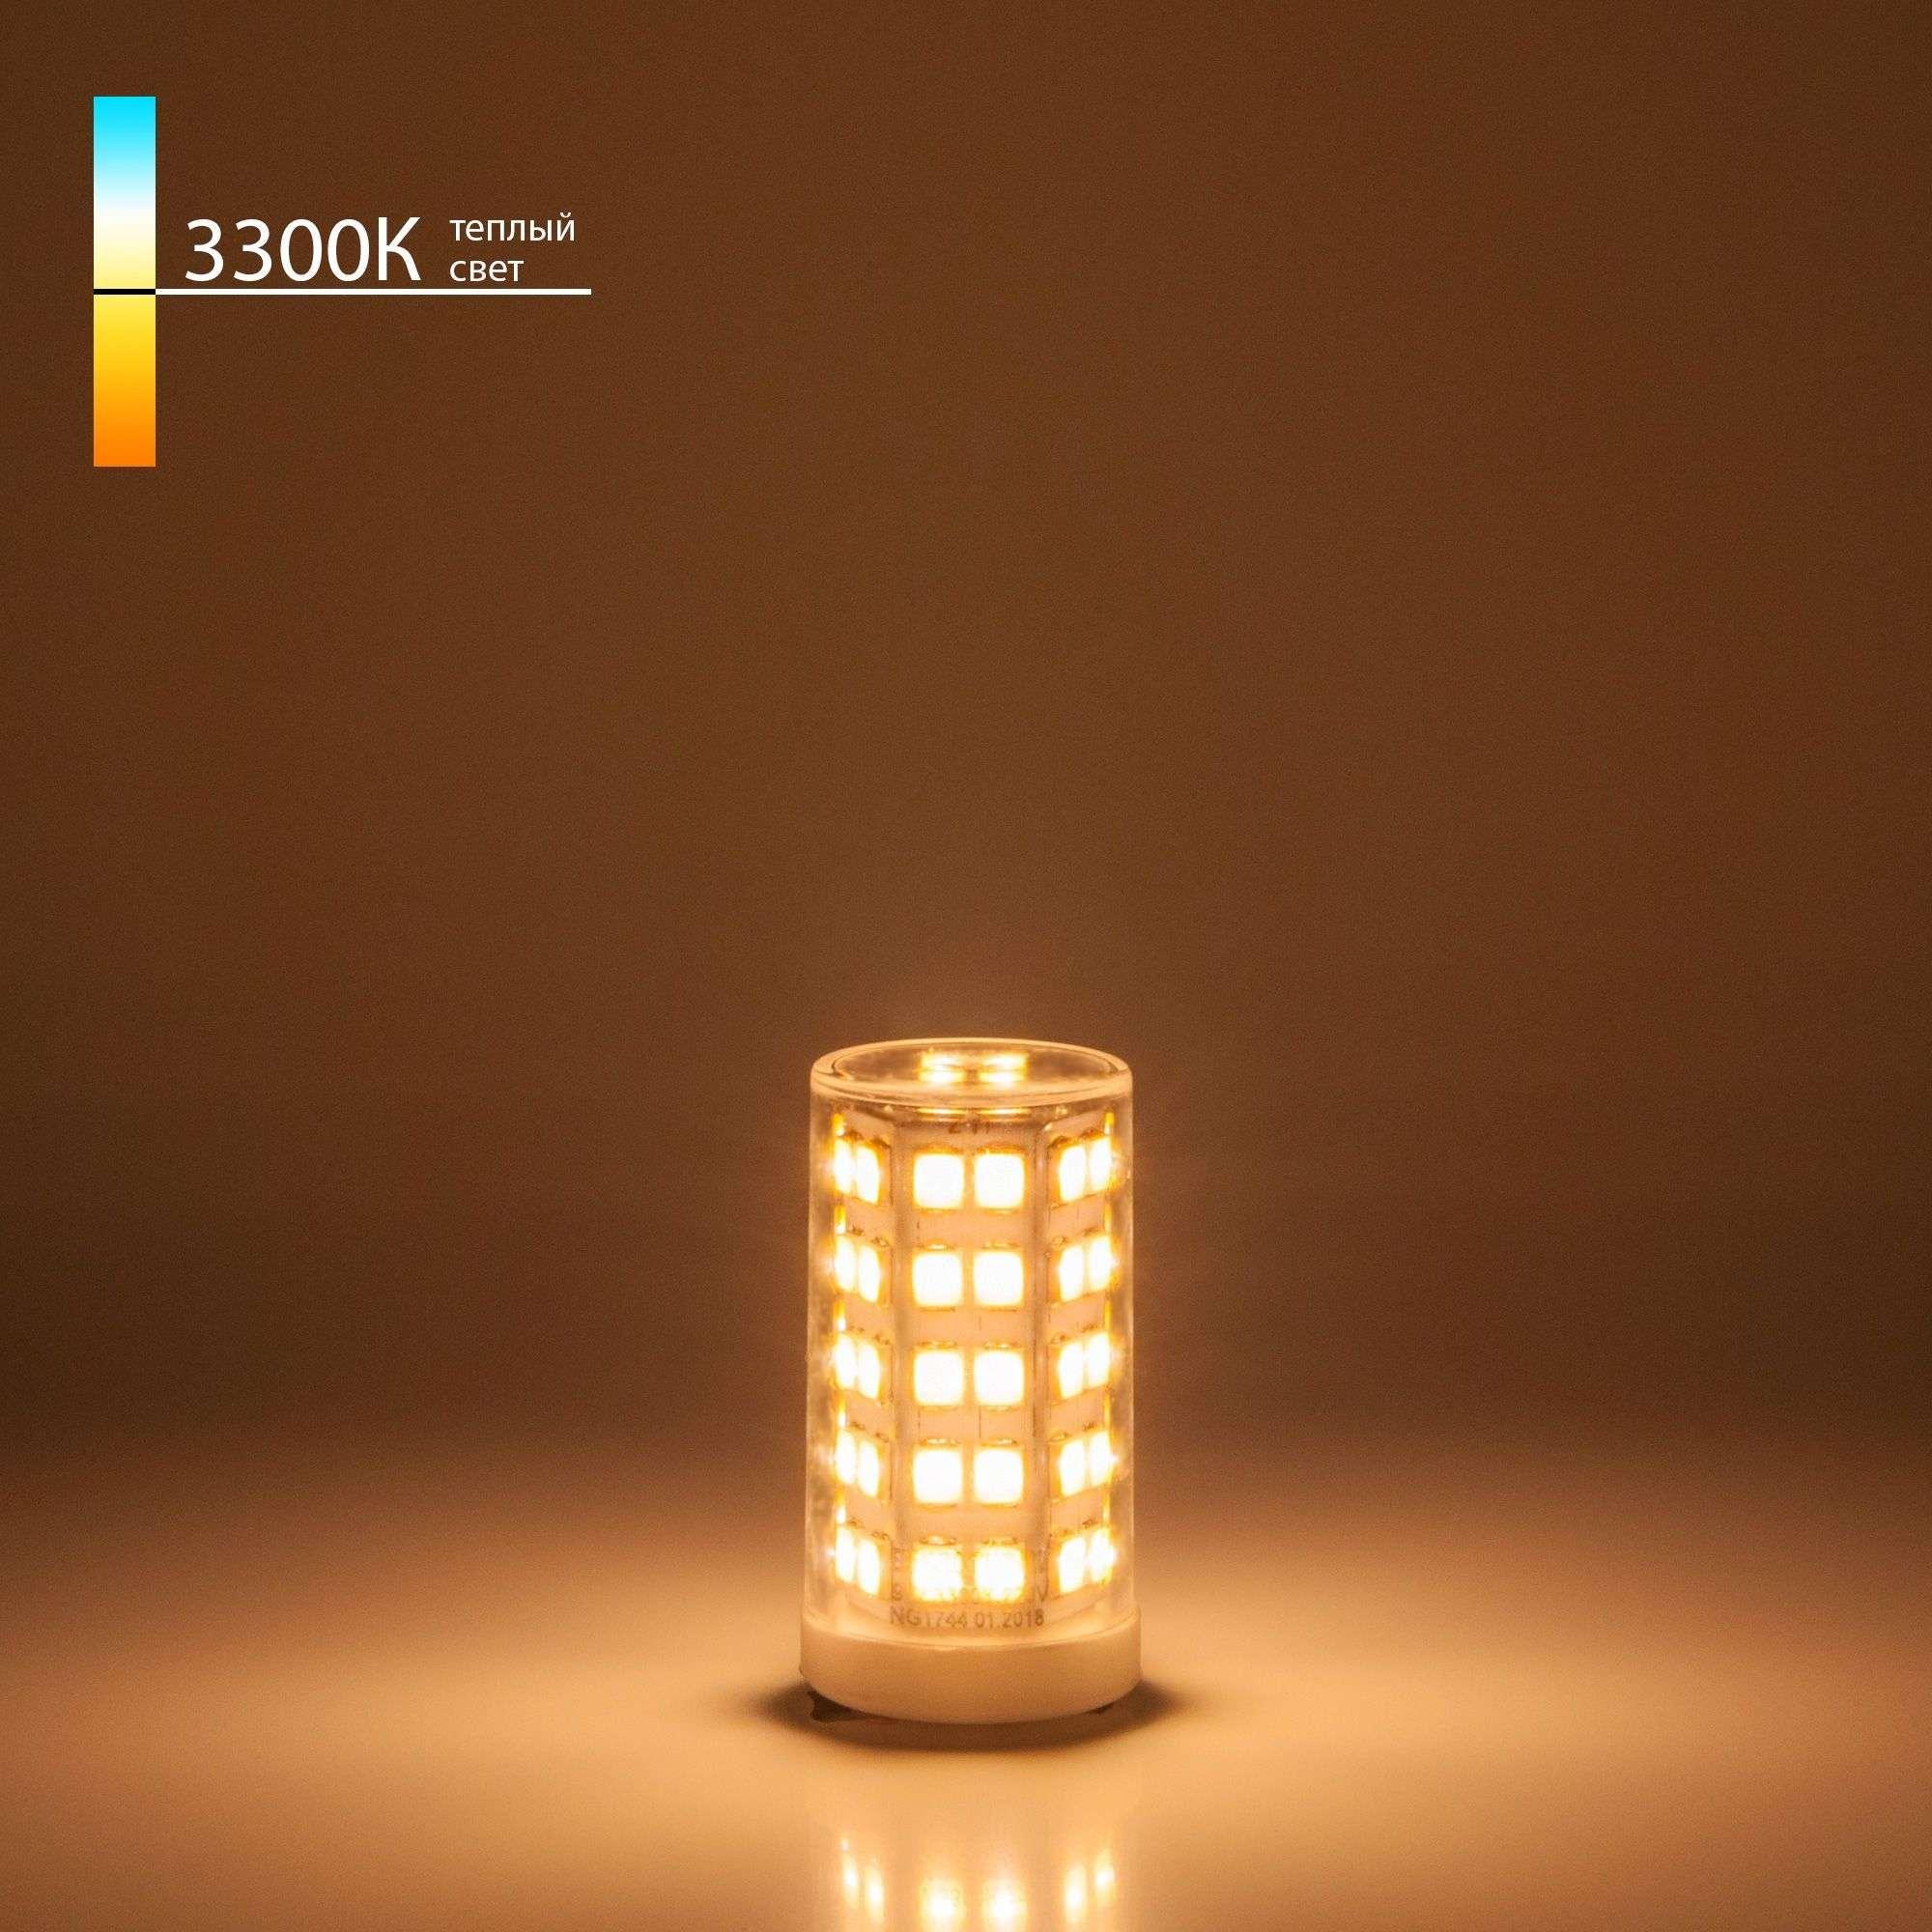 Cветодиодная лампа 9W 3300K G9 G9 LED BL109 9W 220V 3300K